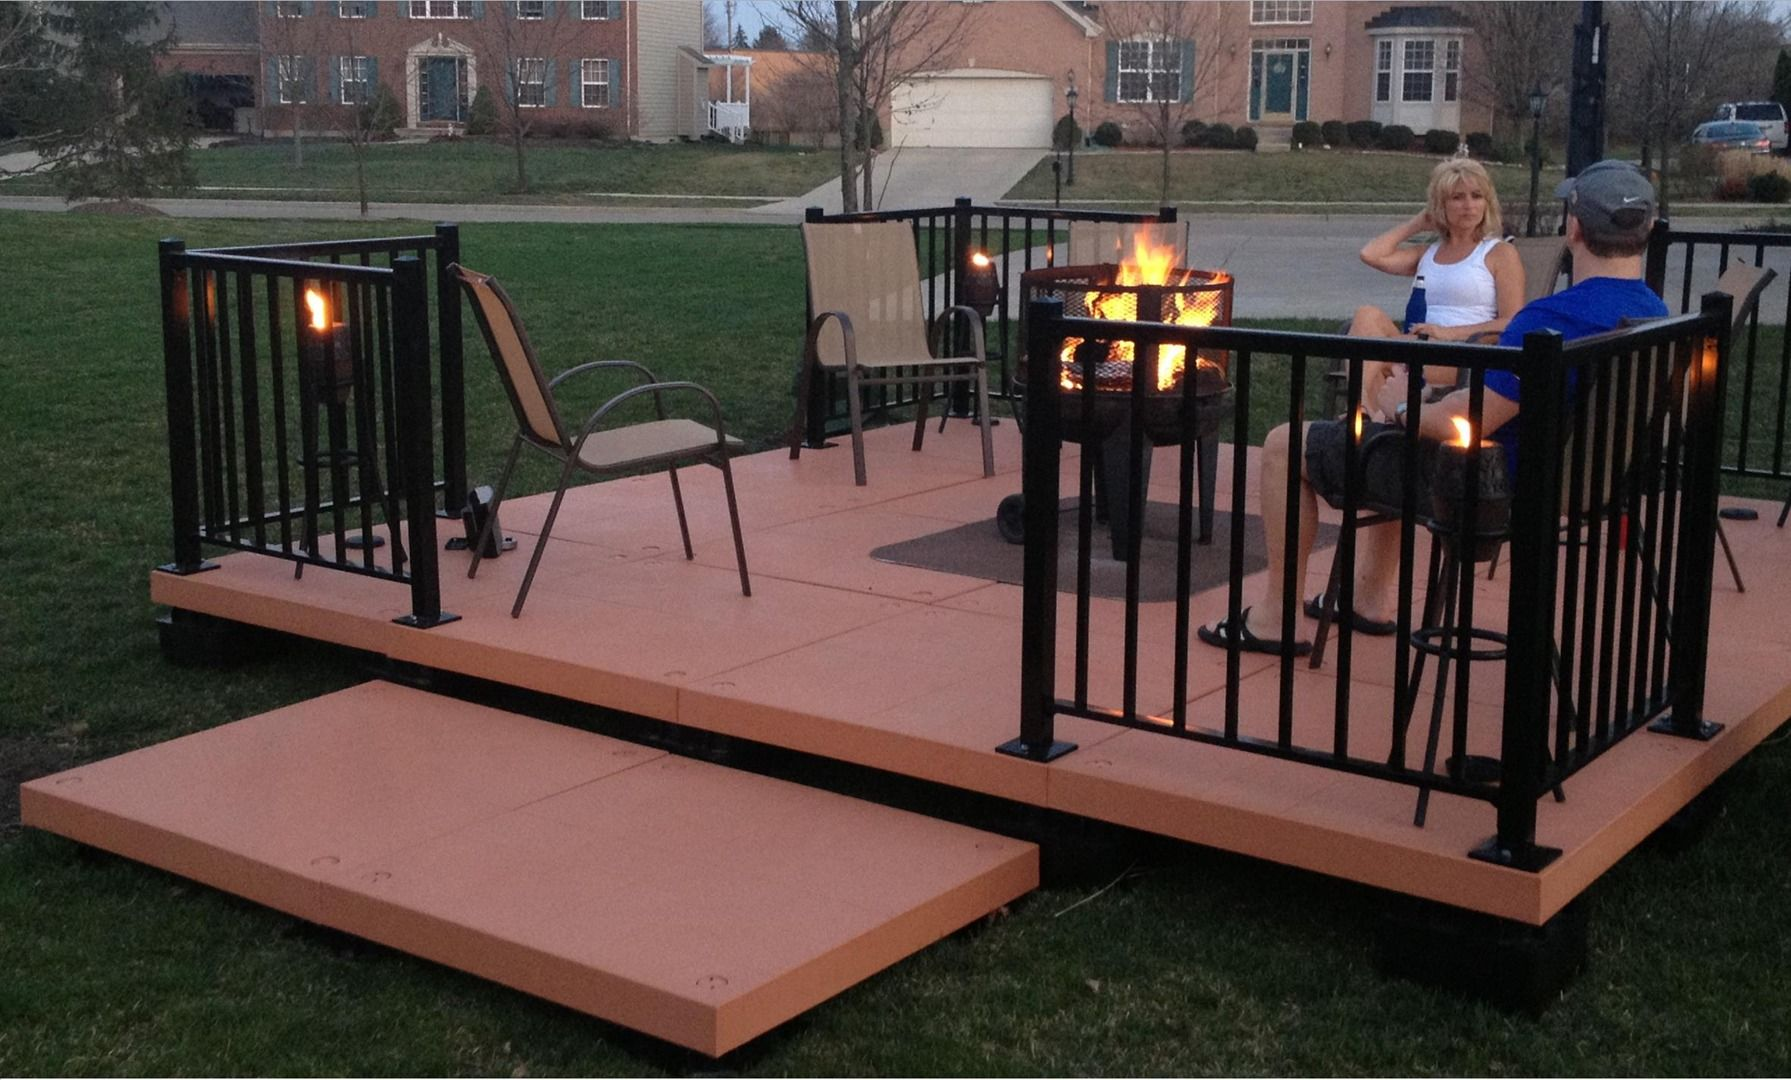 UDECX is a portable modular DIY patio decking system Buy your